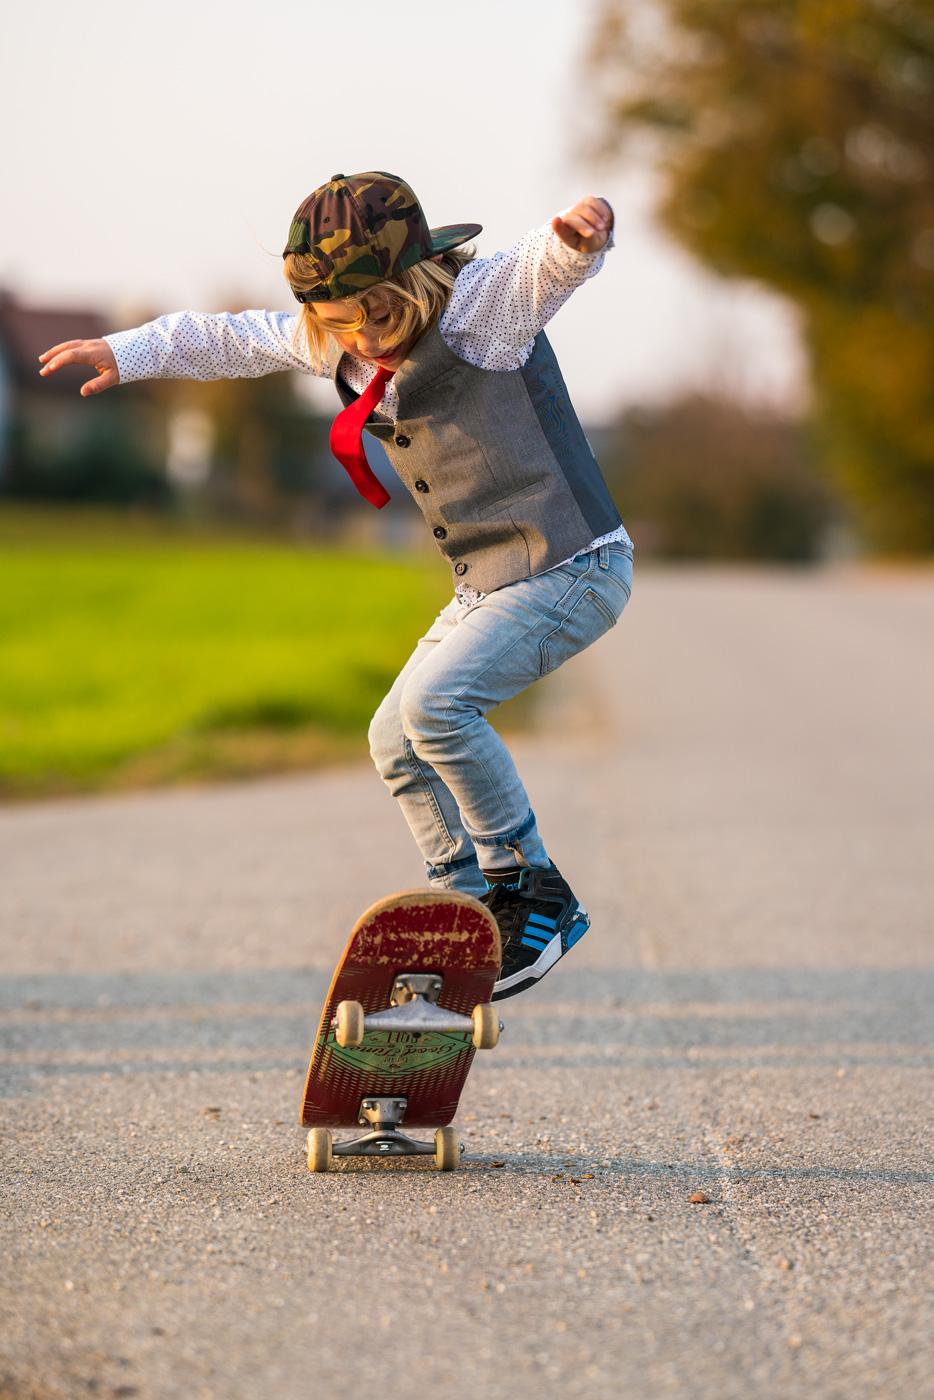 Skate_15